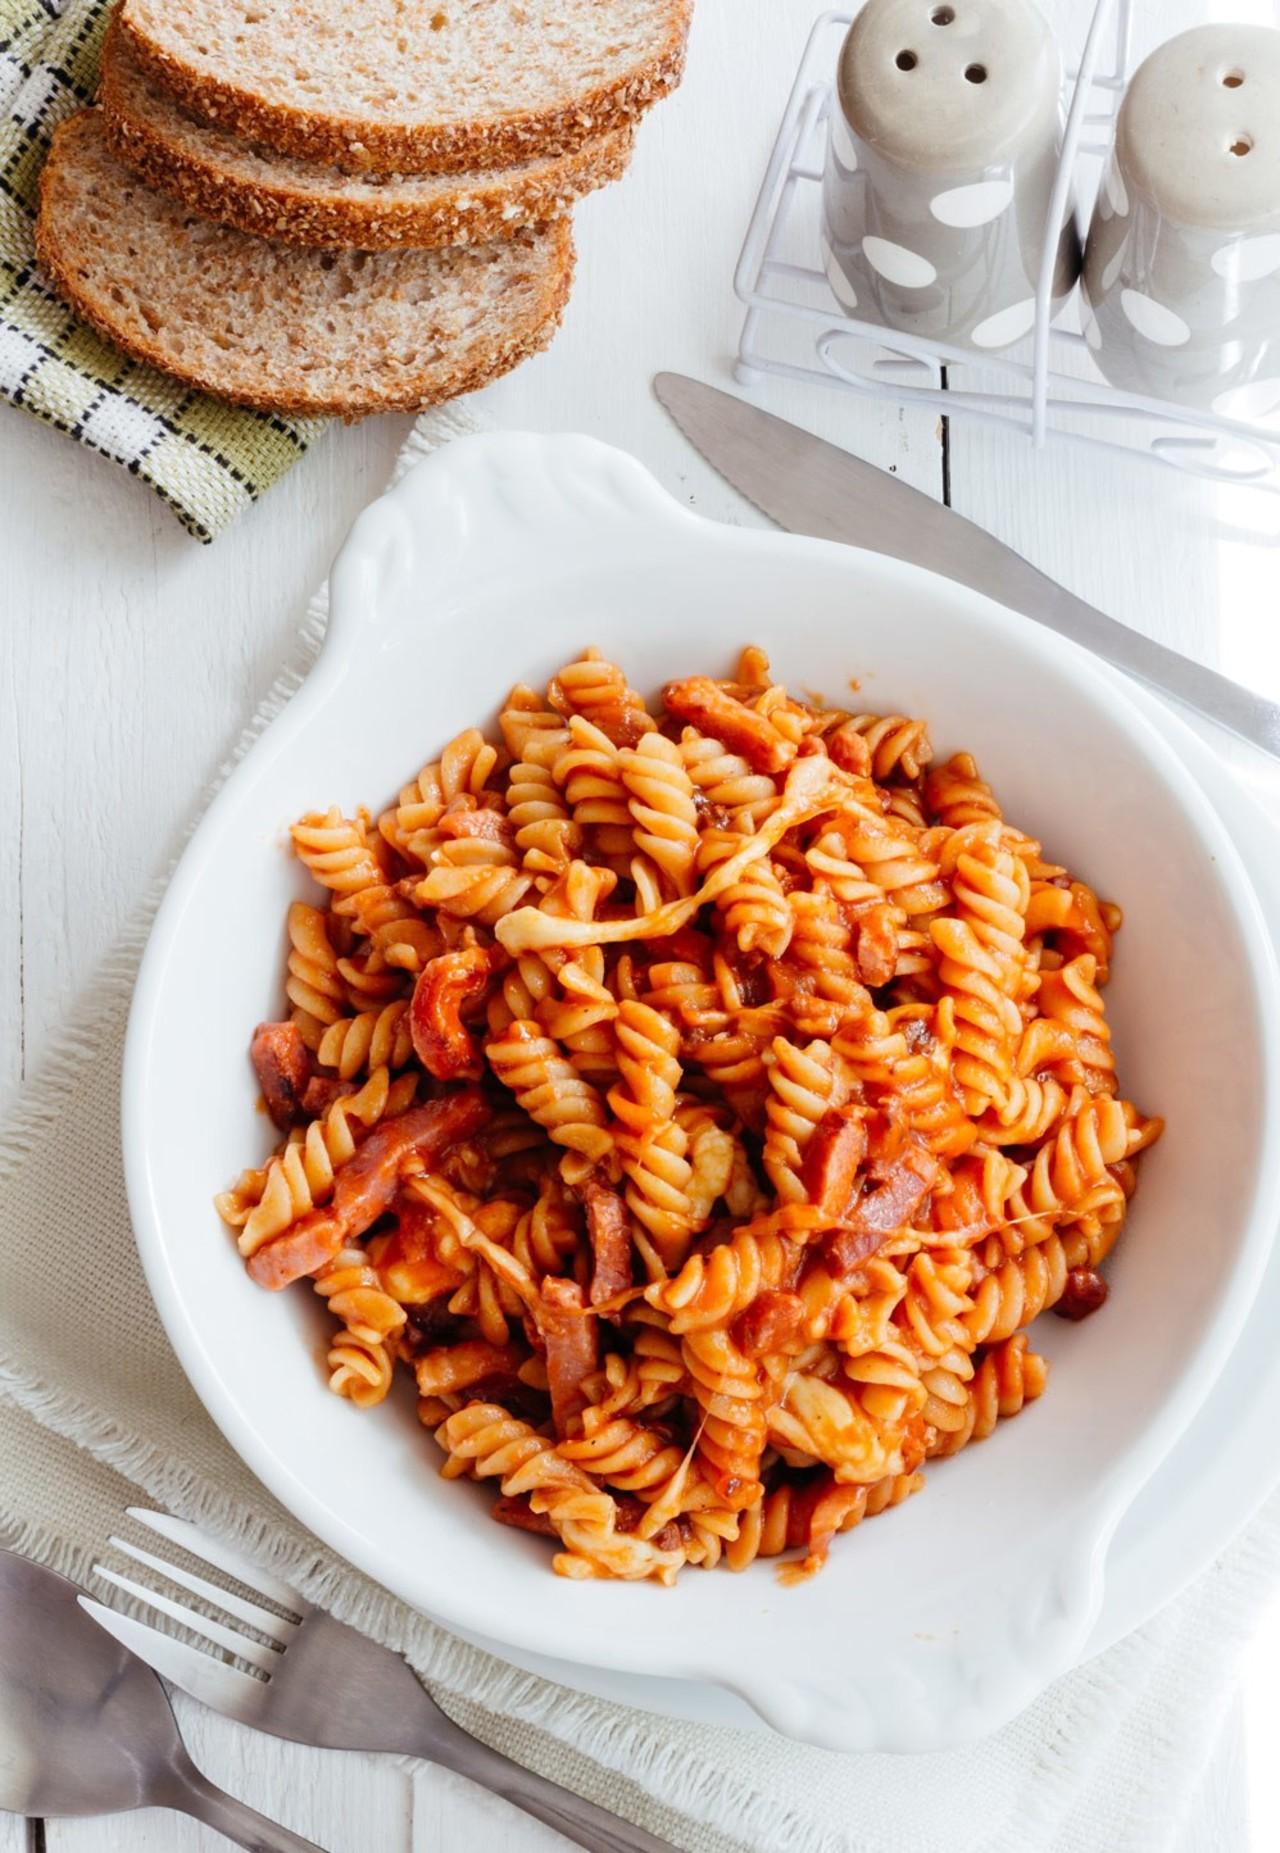 10 motivos para comer pasta